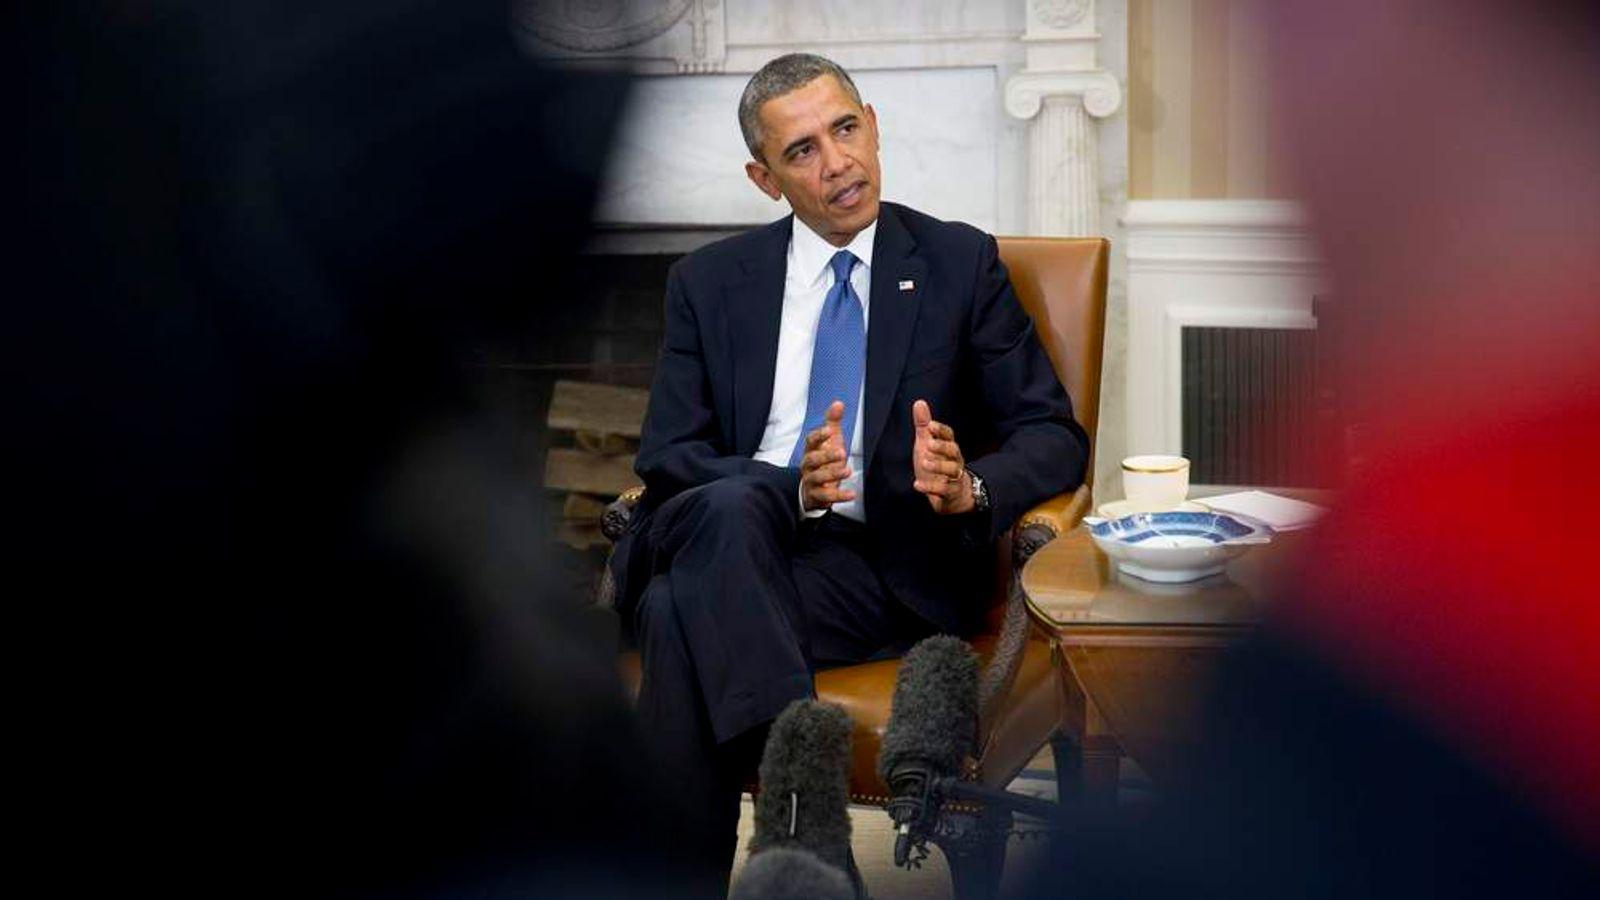 President Obama Meets Israeli Prime Minister Netanyahu At The White House